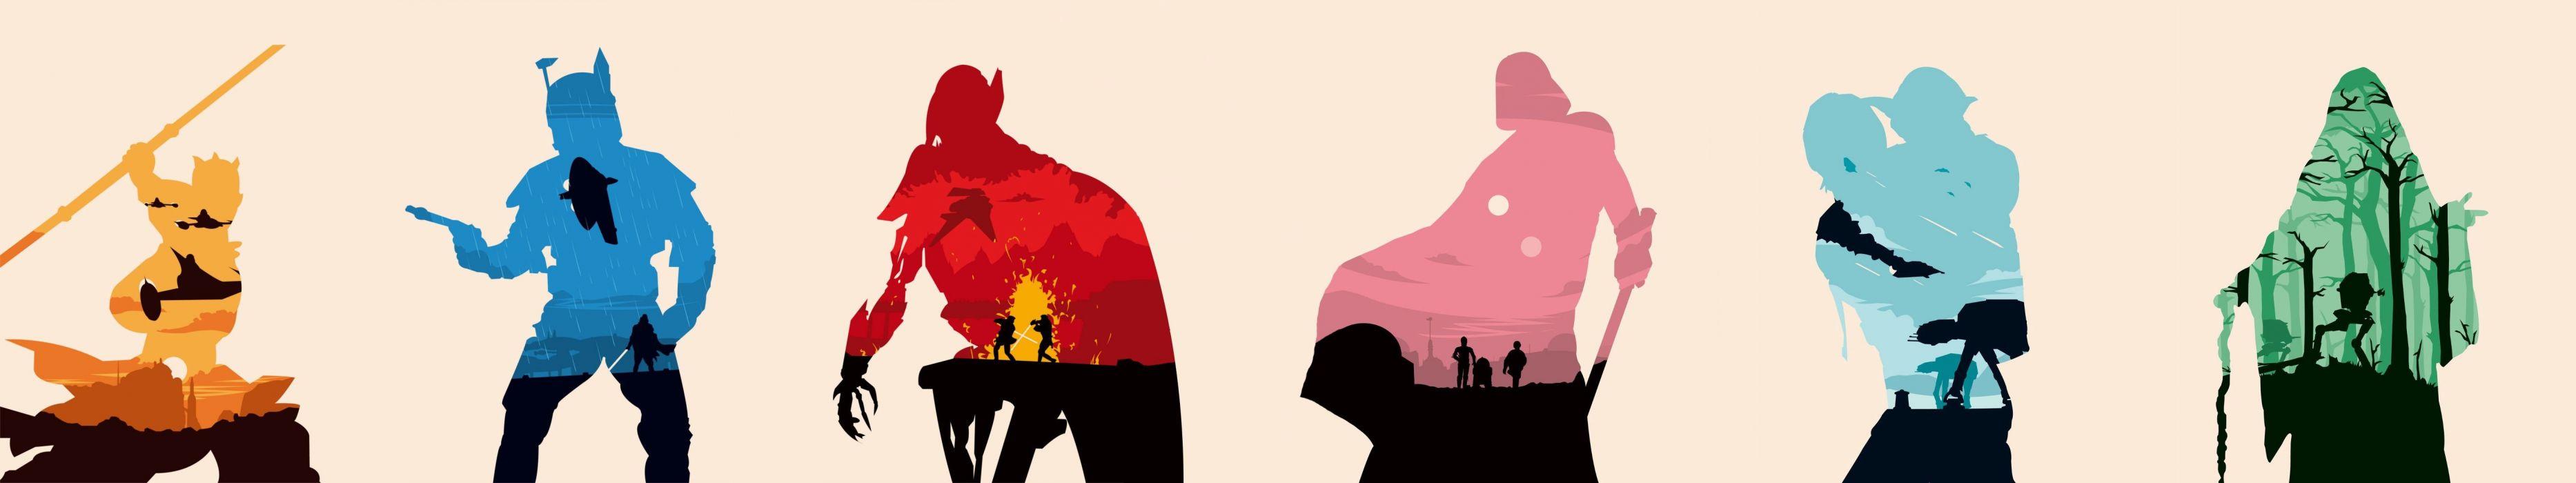 star wars silhouettes wallpaper